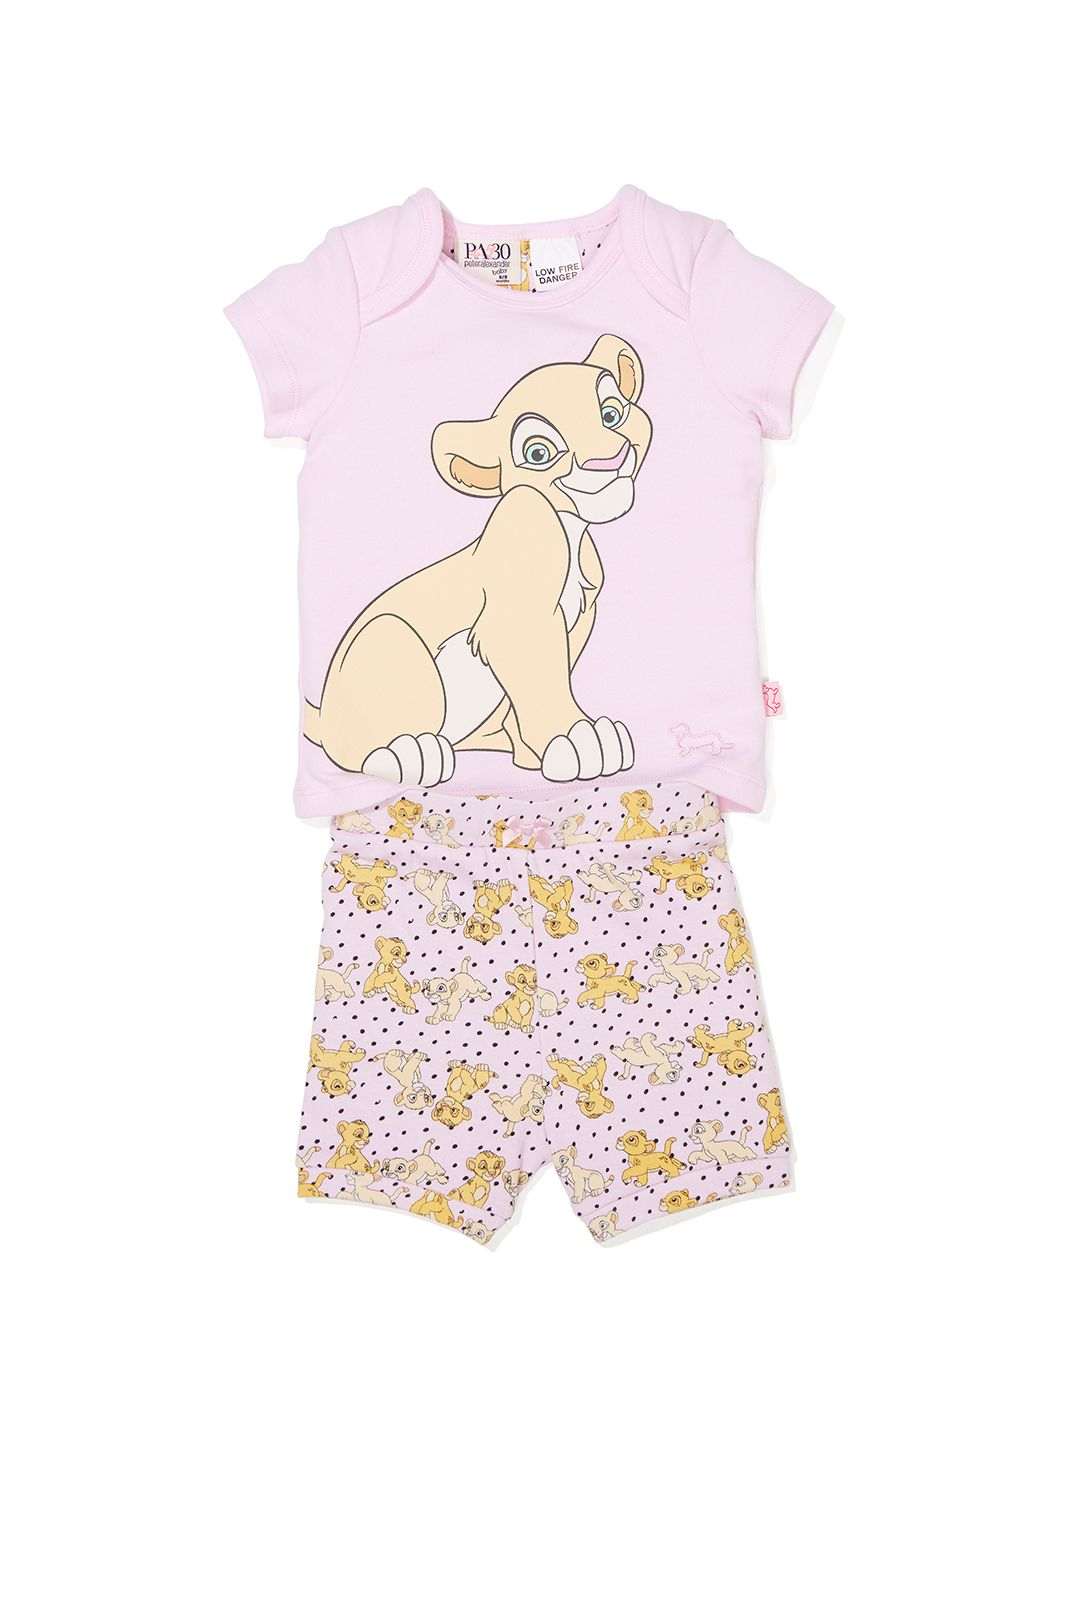 Disney The Lion King Toddler 2-Piece Pajama Set